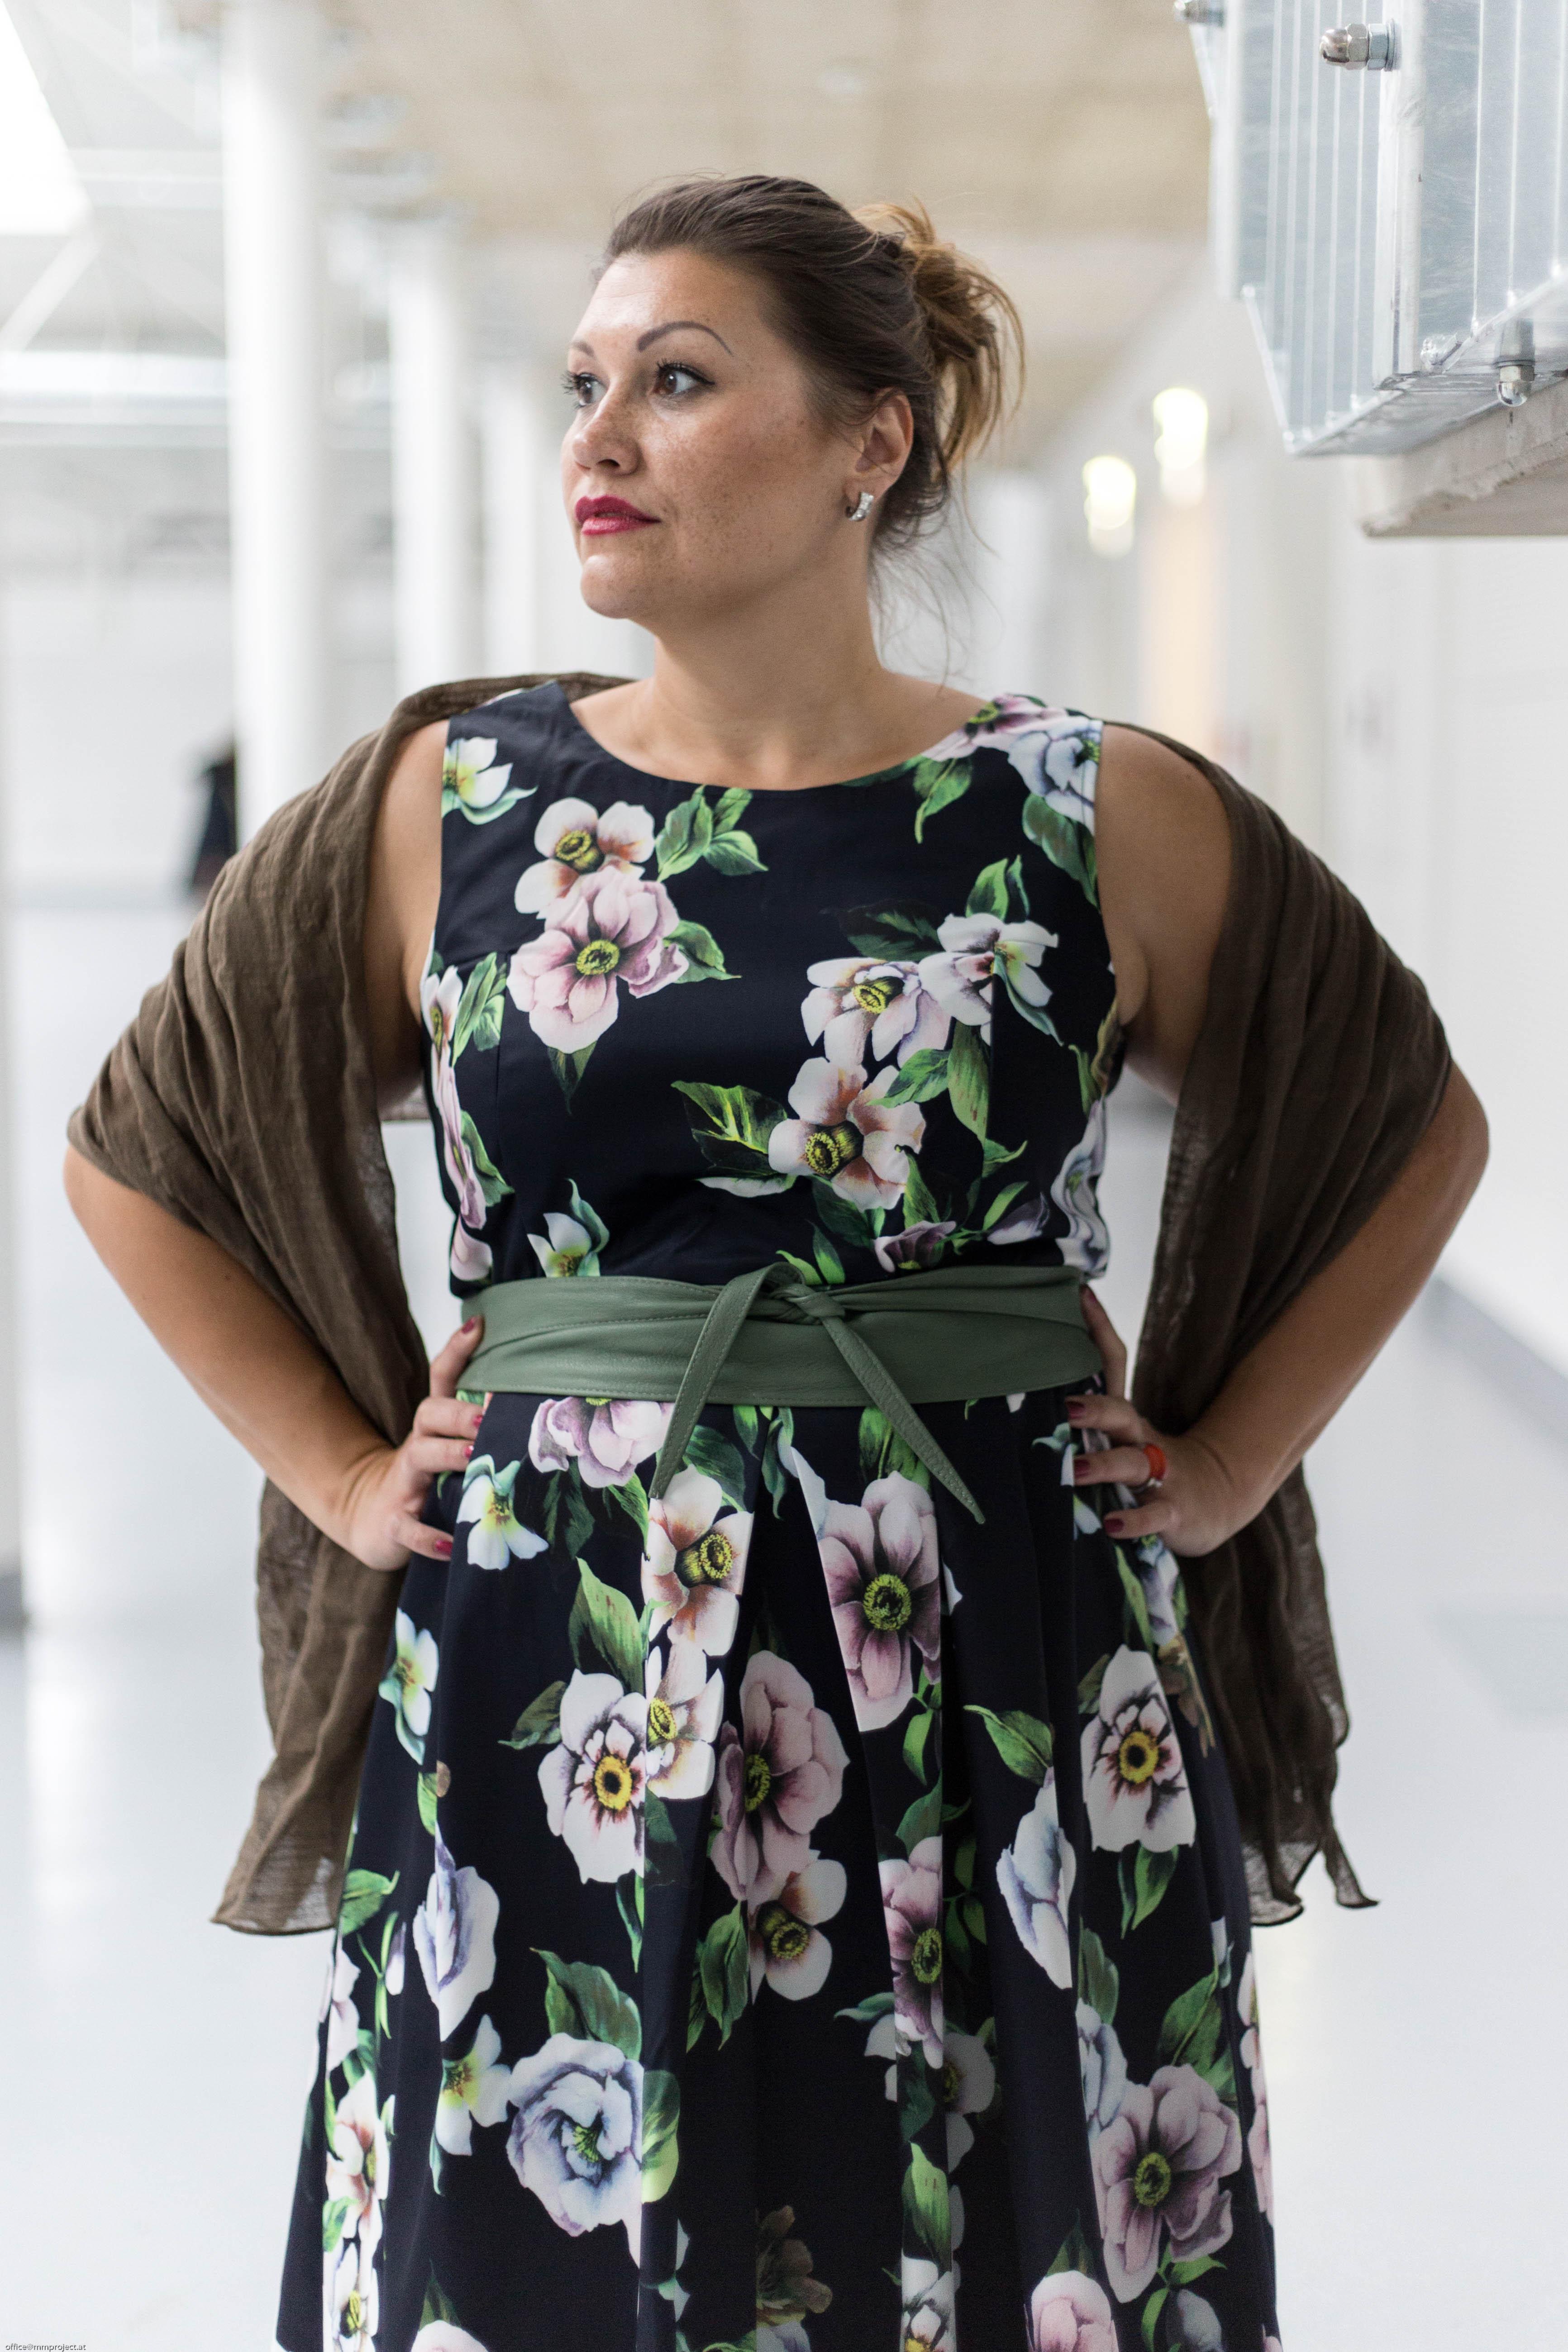 kardiaserena rockabilly style elegant zizzi fashion plus size fashion blumenmuster flowerprint blumenprint schal